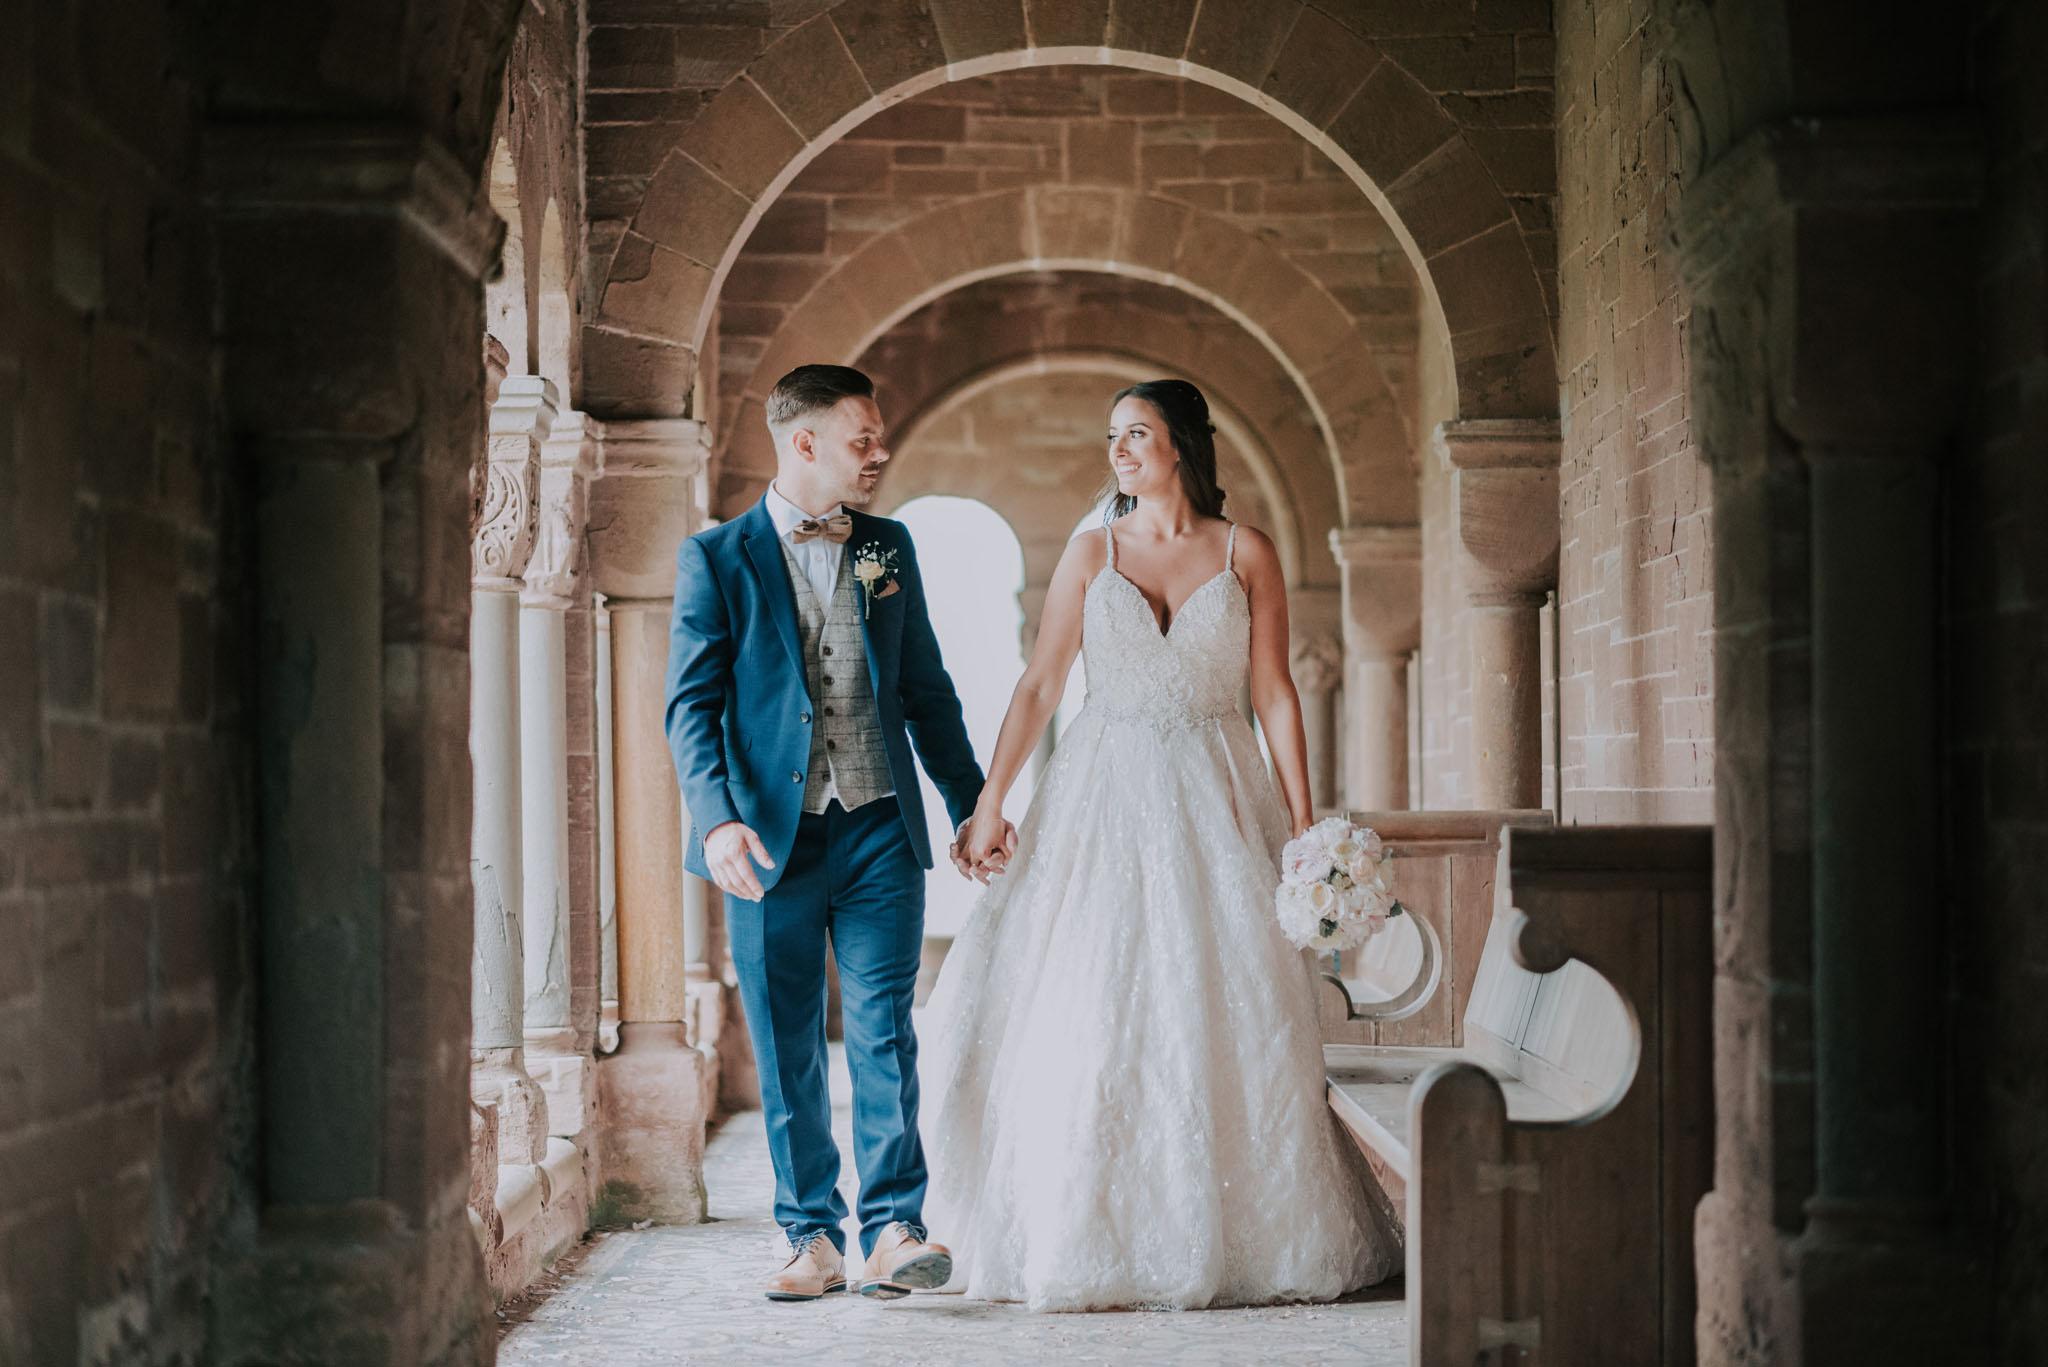 wedding-photographer-glewstone-court-hereford-scott-stockwell-photography300.jpg